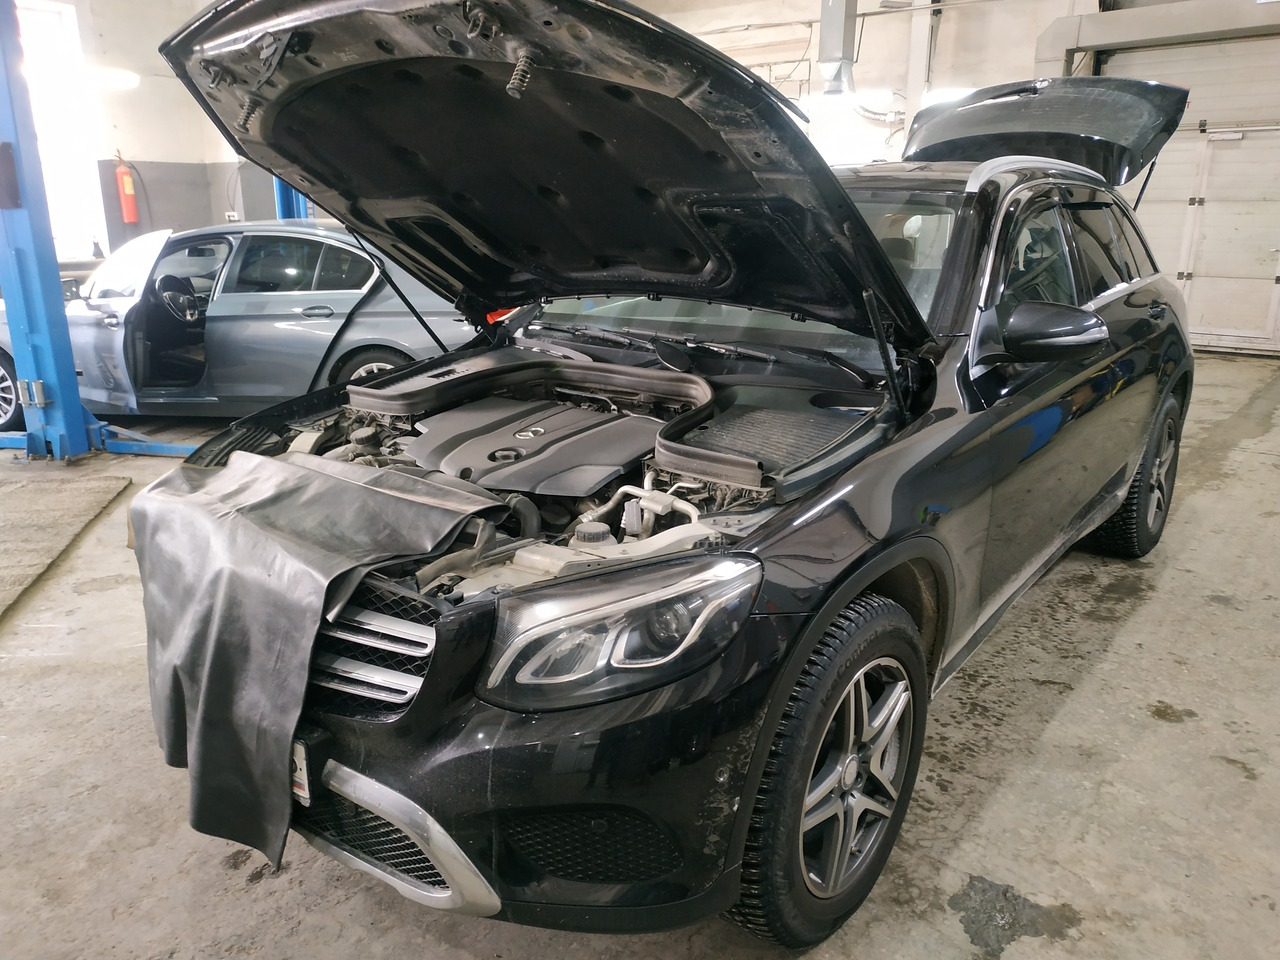 Mercedes Benz GLС 250D 4МАТIС 2017 г.в.